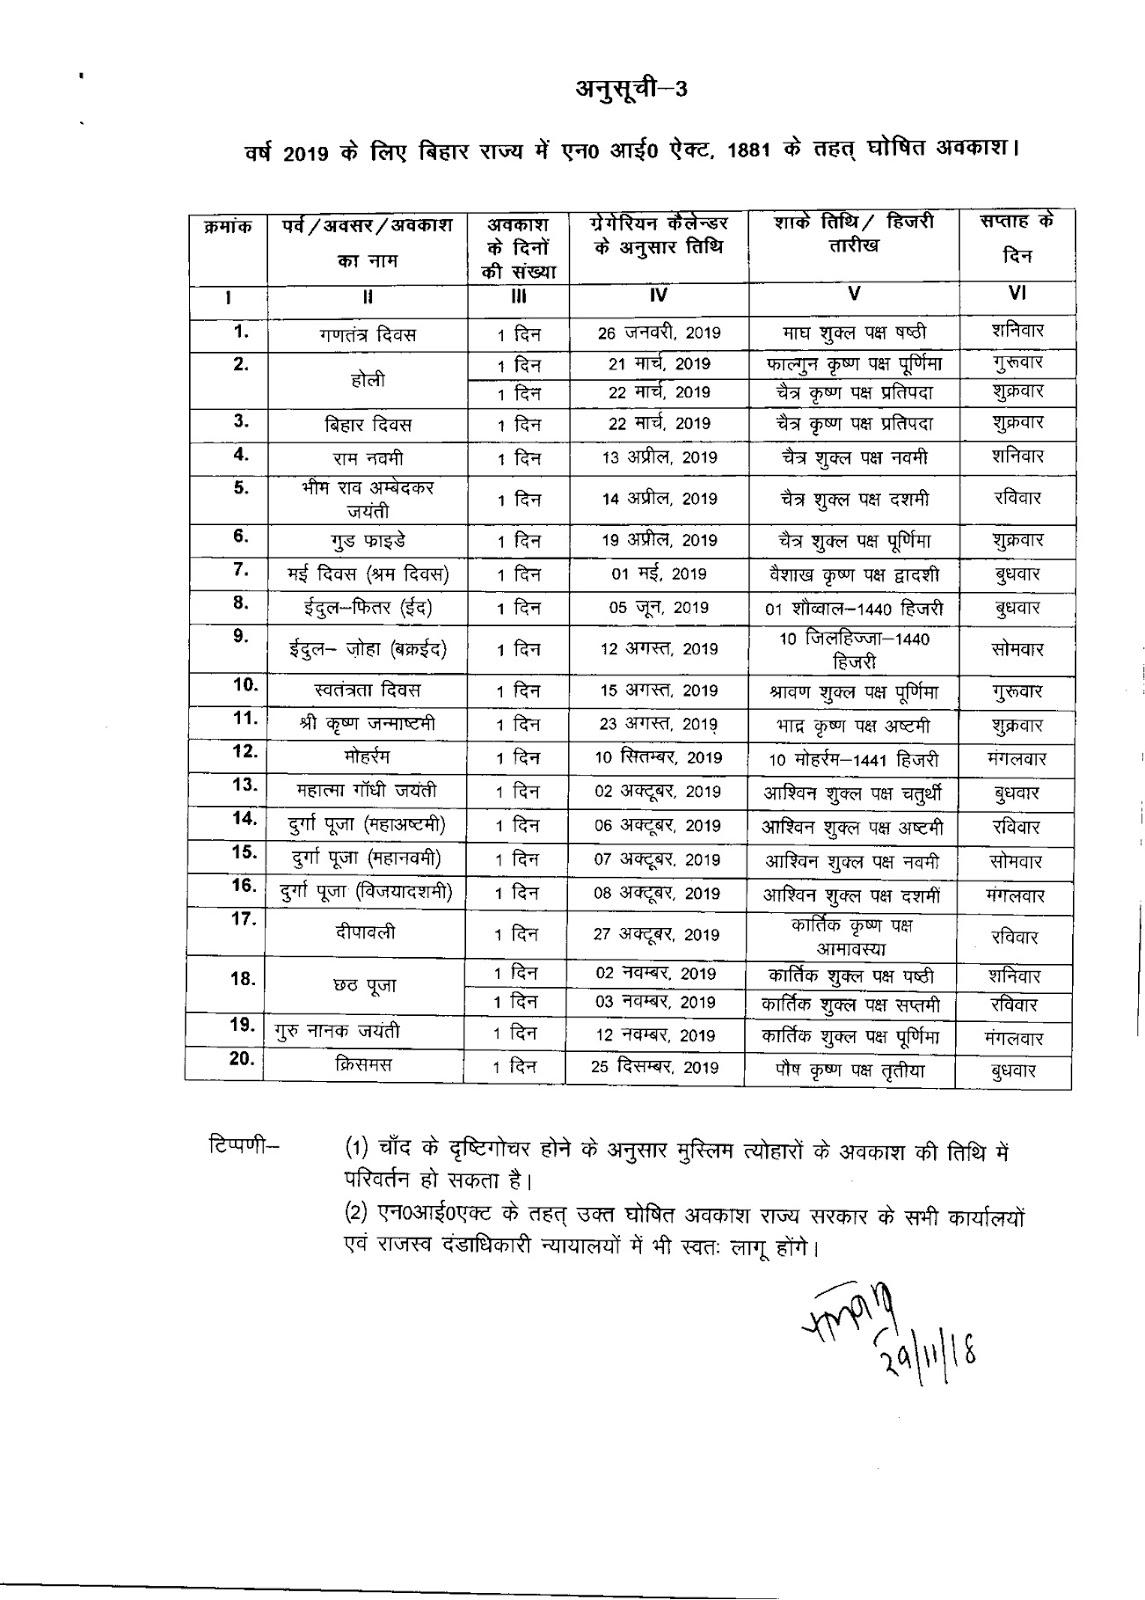 Bihar Government Calendar 2019 #educratsweb inside Bihar Govt. Calendar 2020